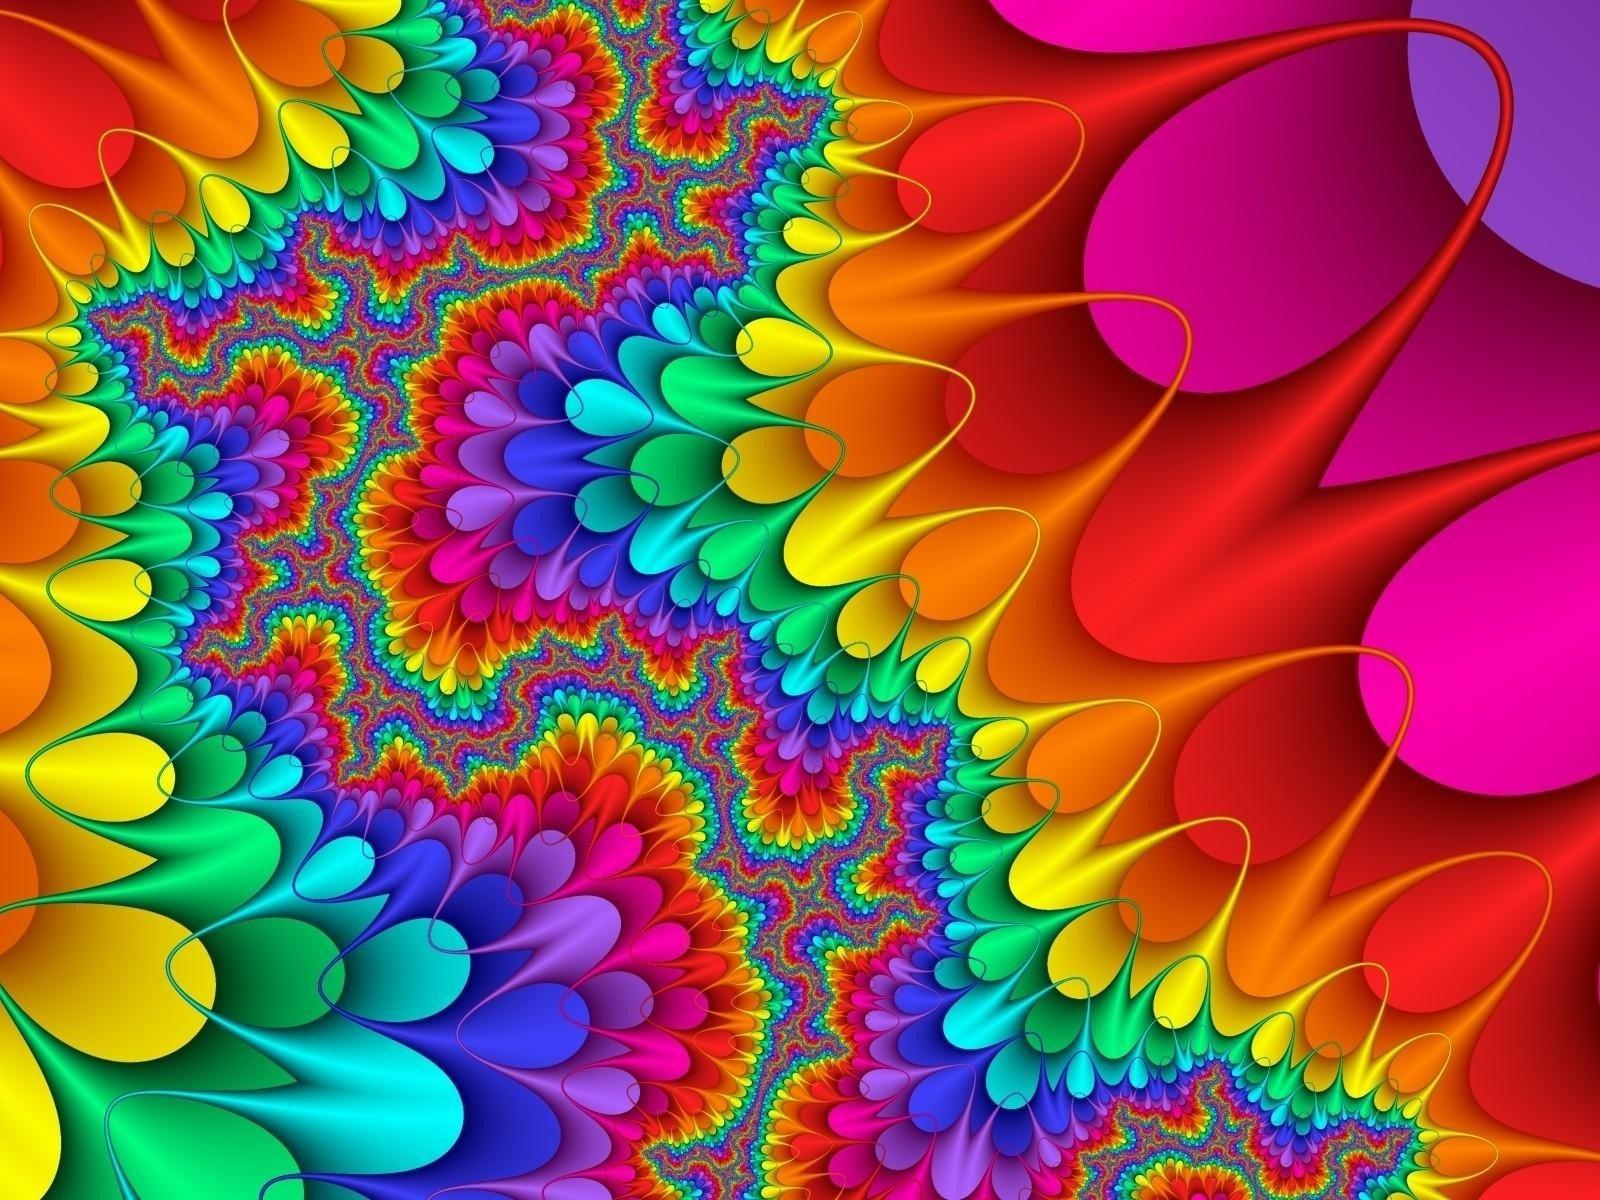 Backgrounds Hd Tie Dye Colorful Vortex Swirls Wallpaper: Cute Bright Colorful Backgrounds Wallpaper